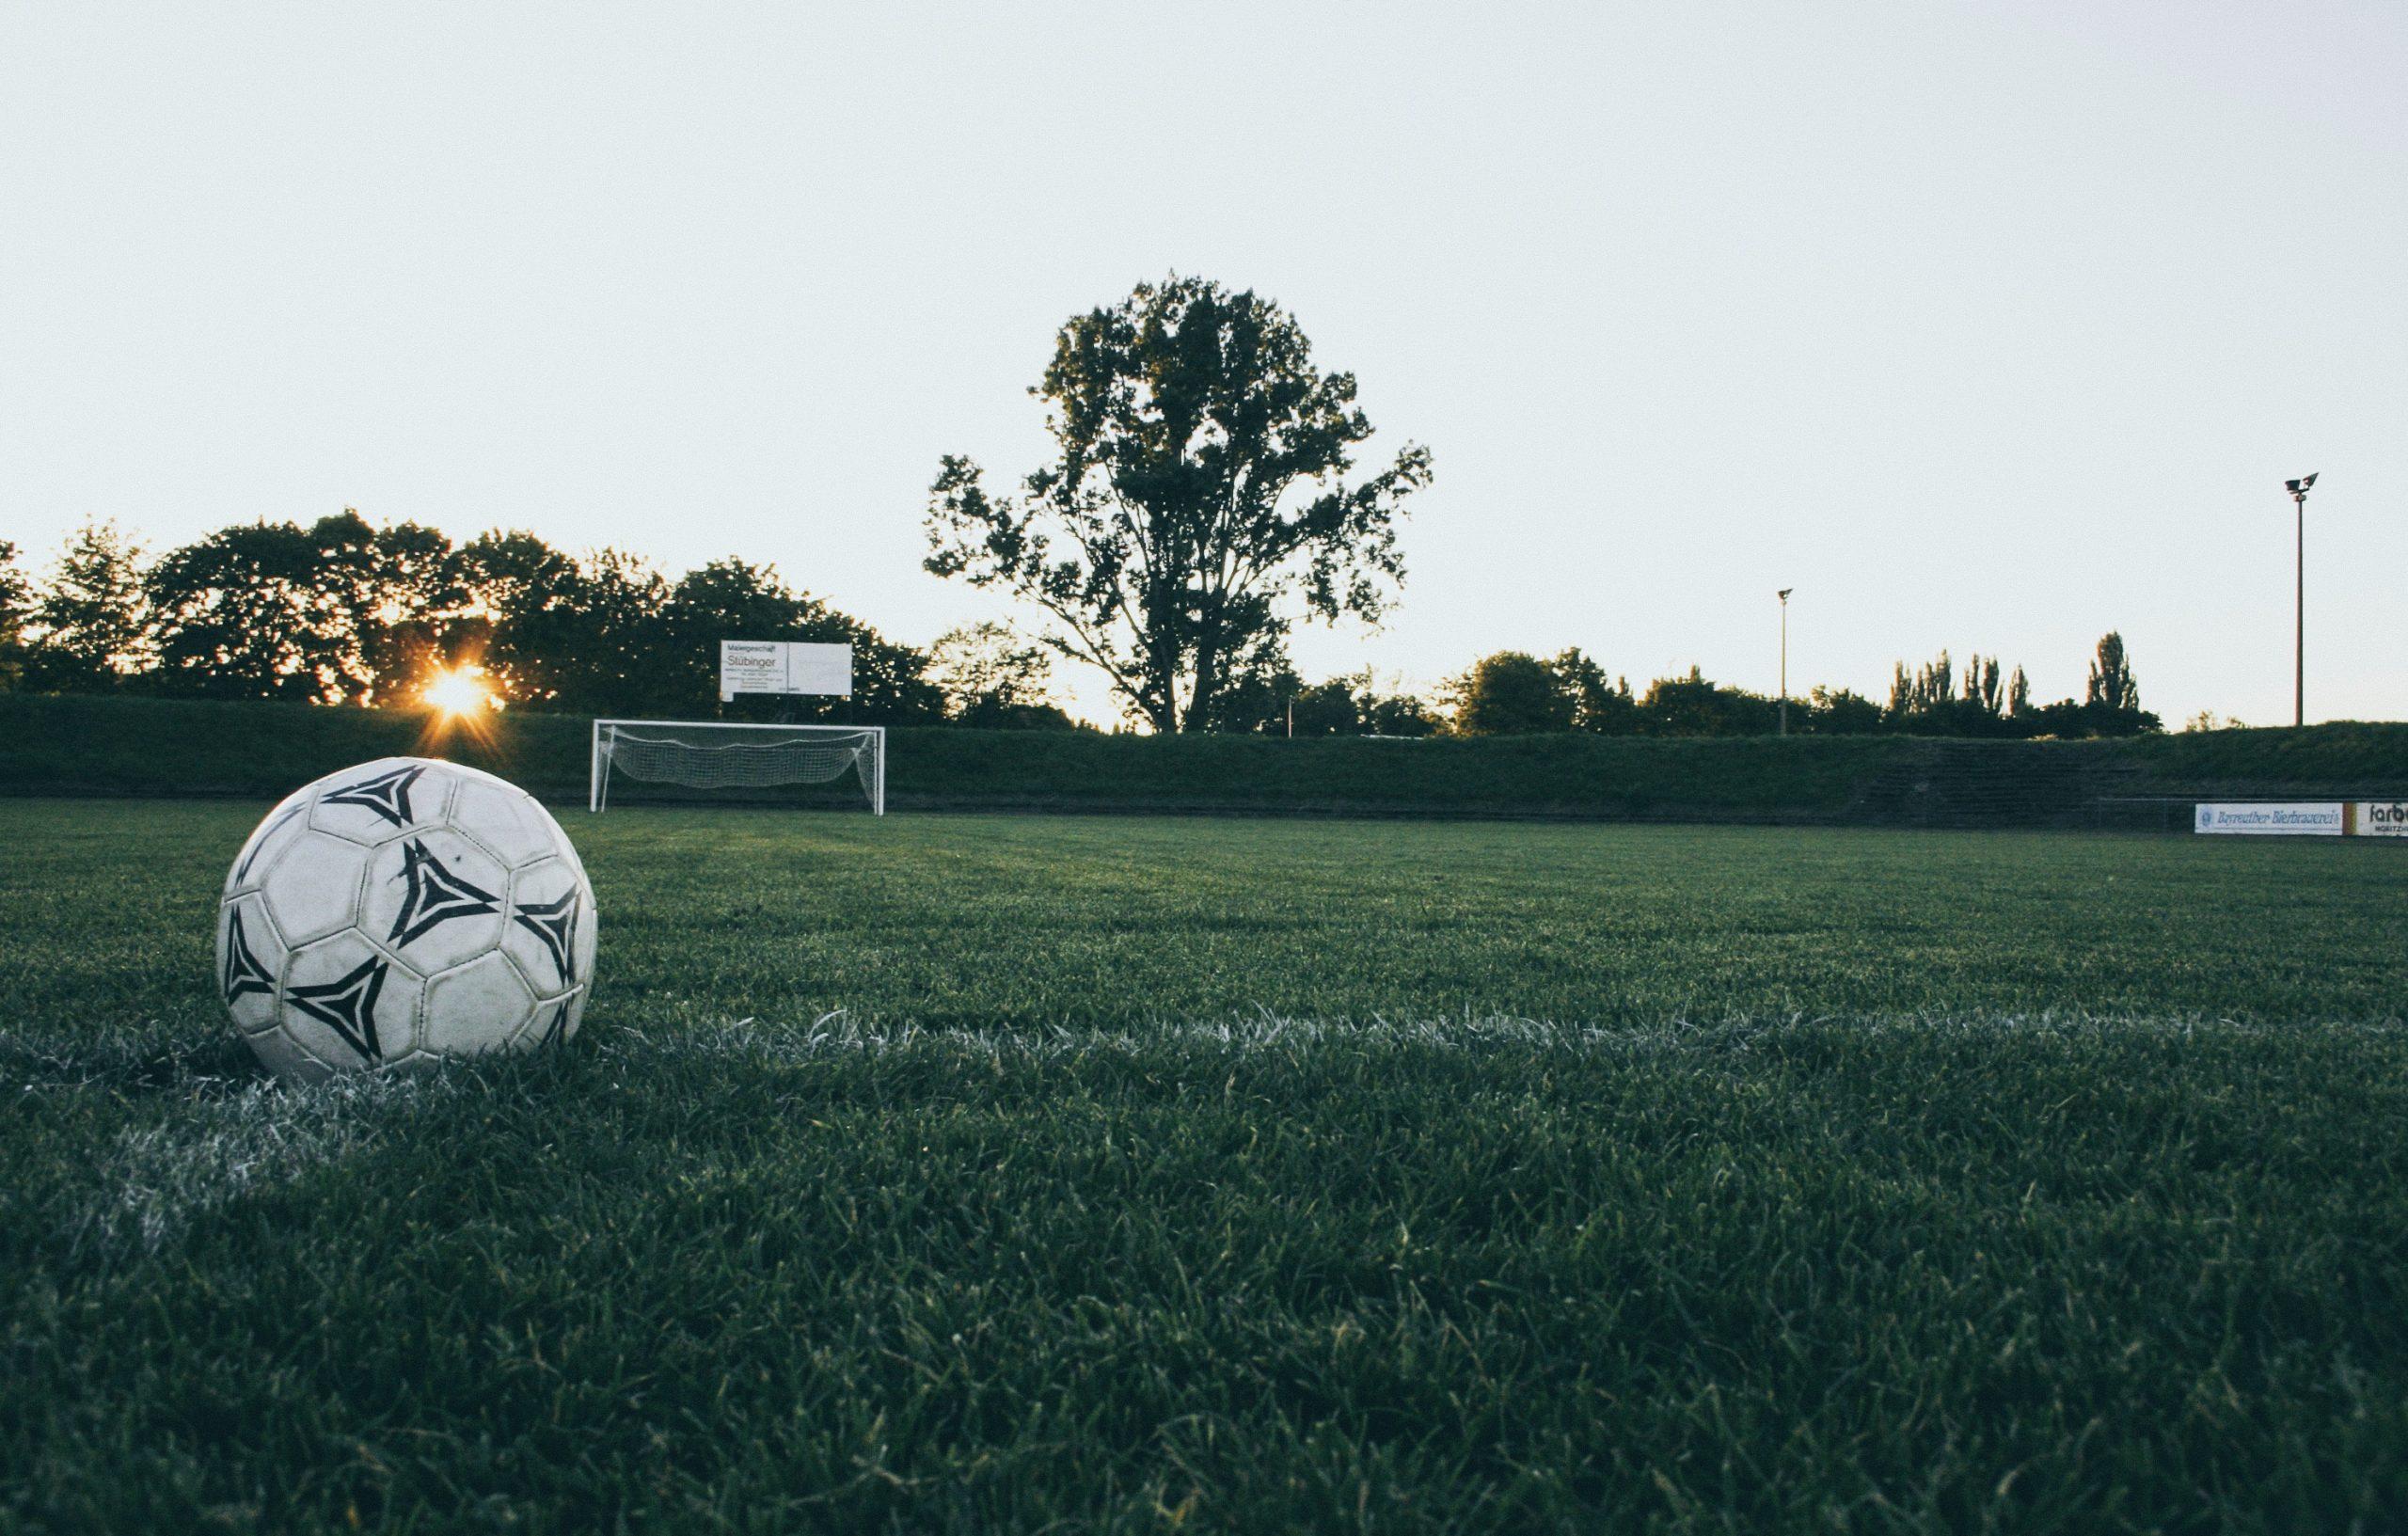 soccer ball Photo by Markus Spiske from Pexels